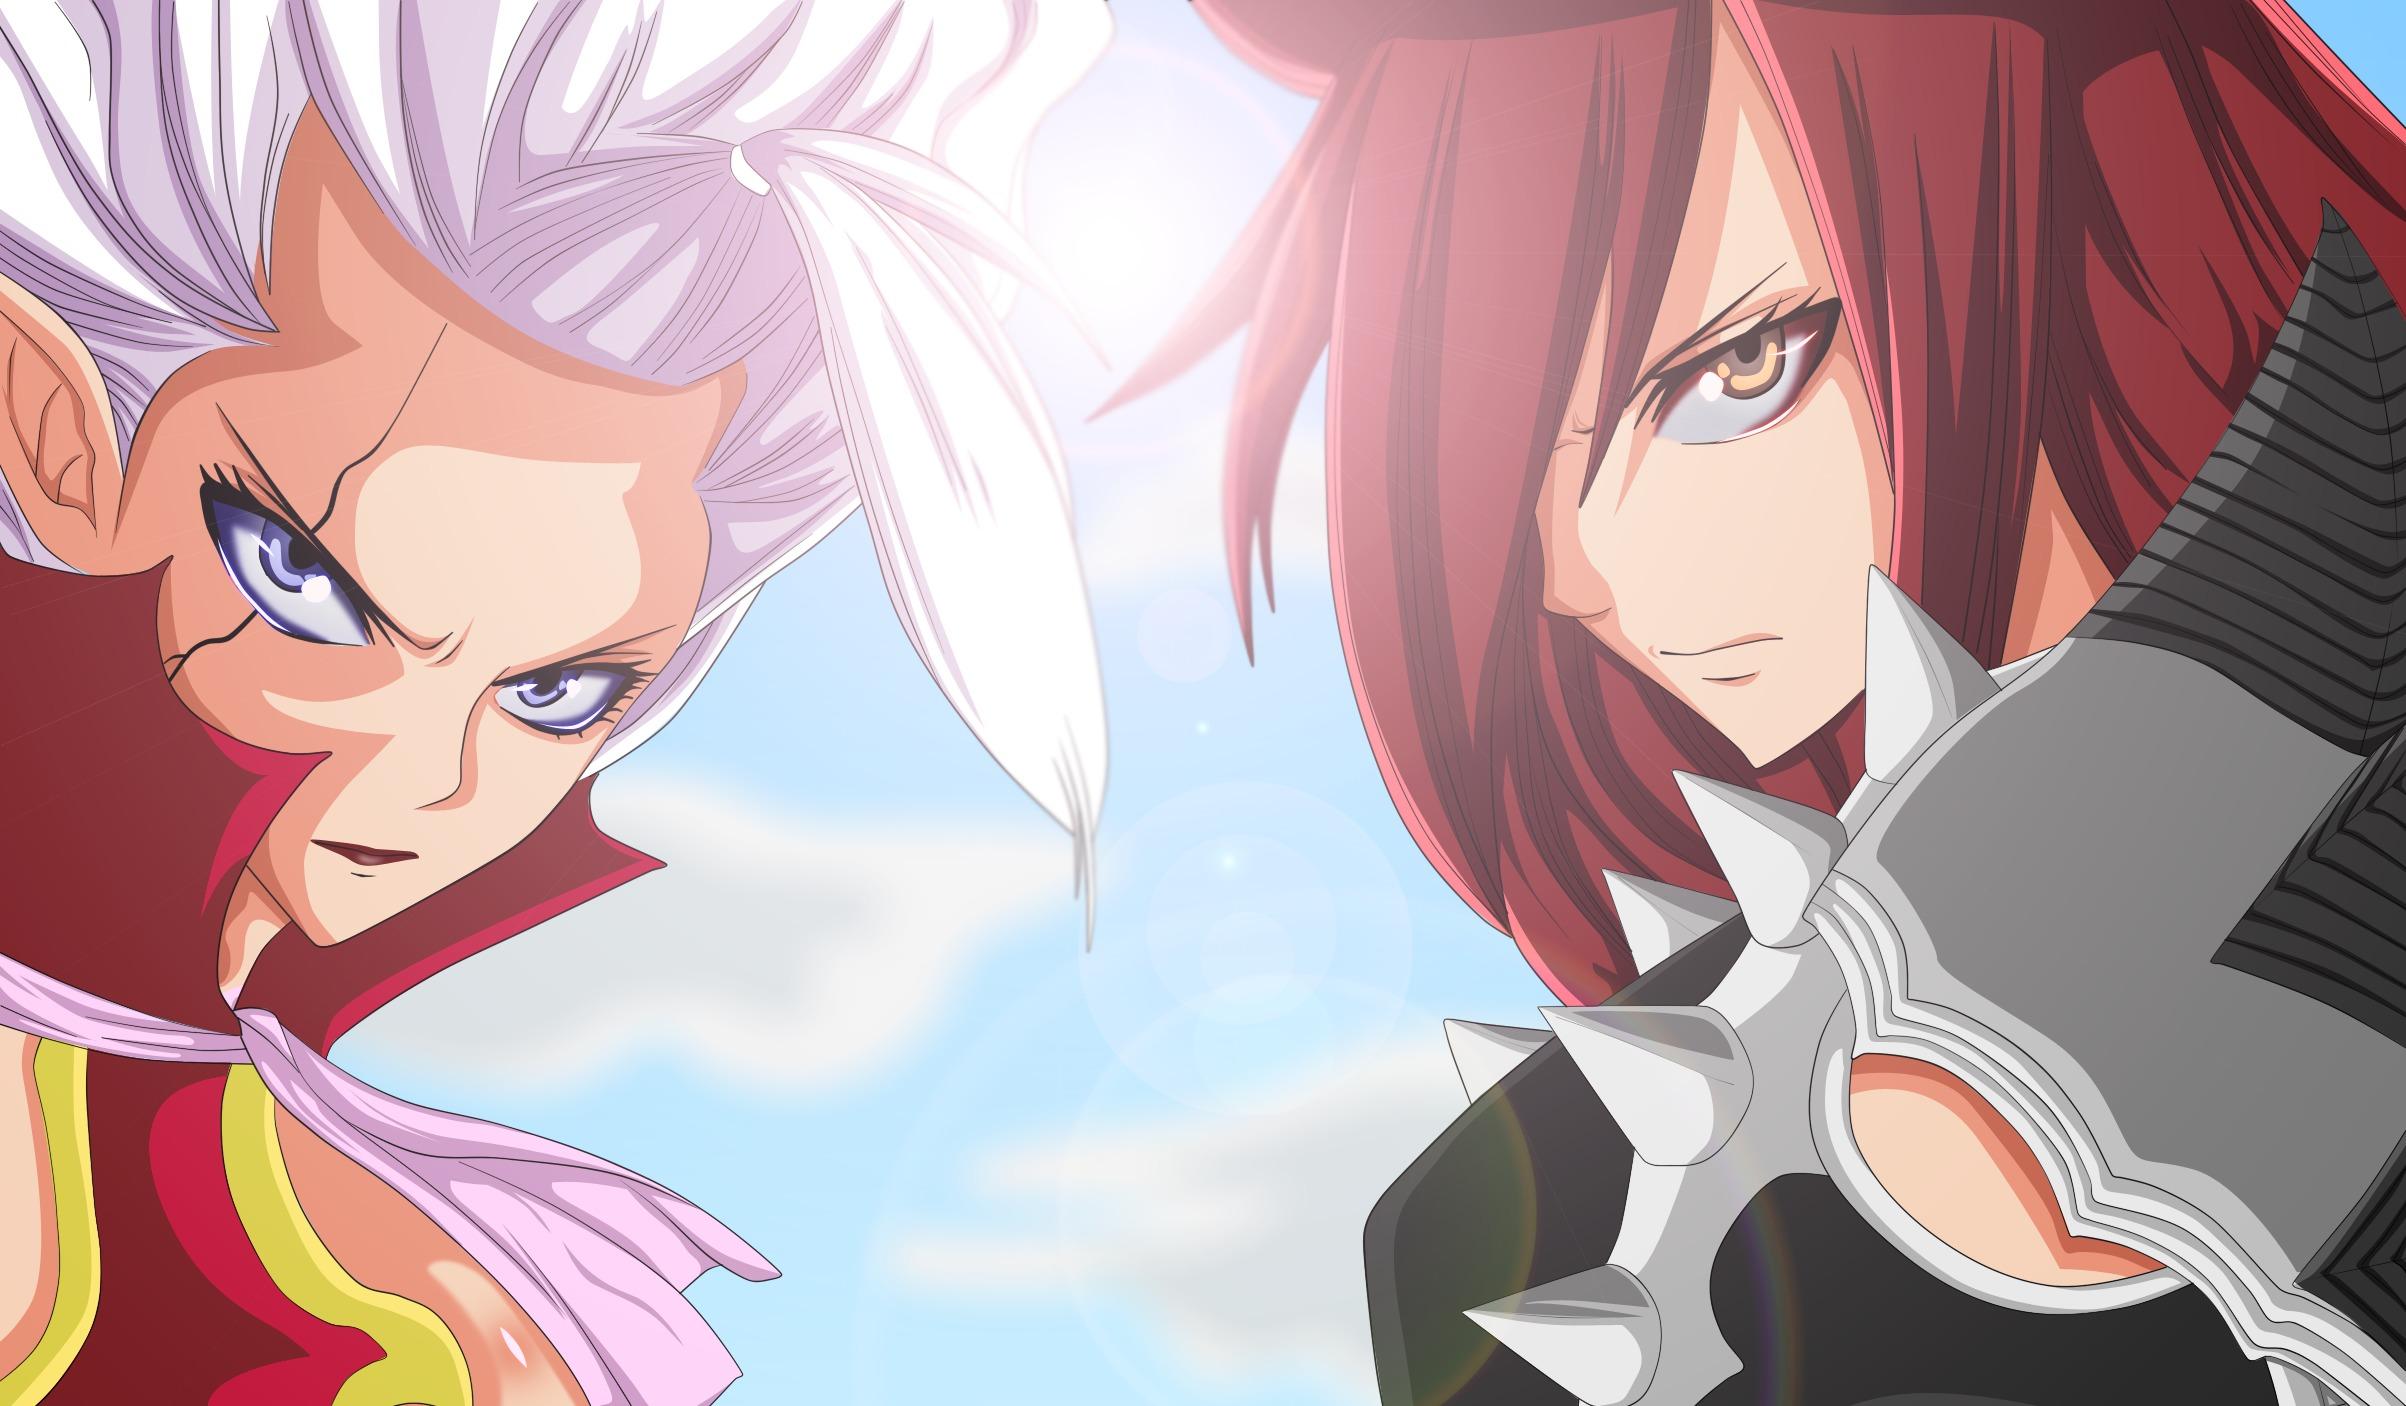 Wallpaper Fairy Tail Erza Scarlet Mirajane Strauss Face Anime